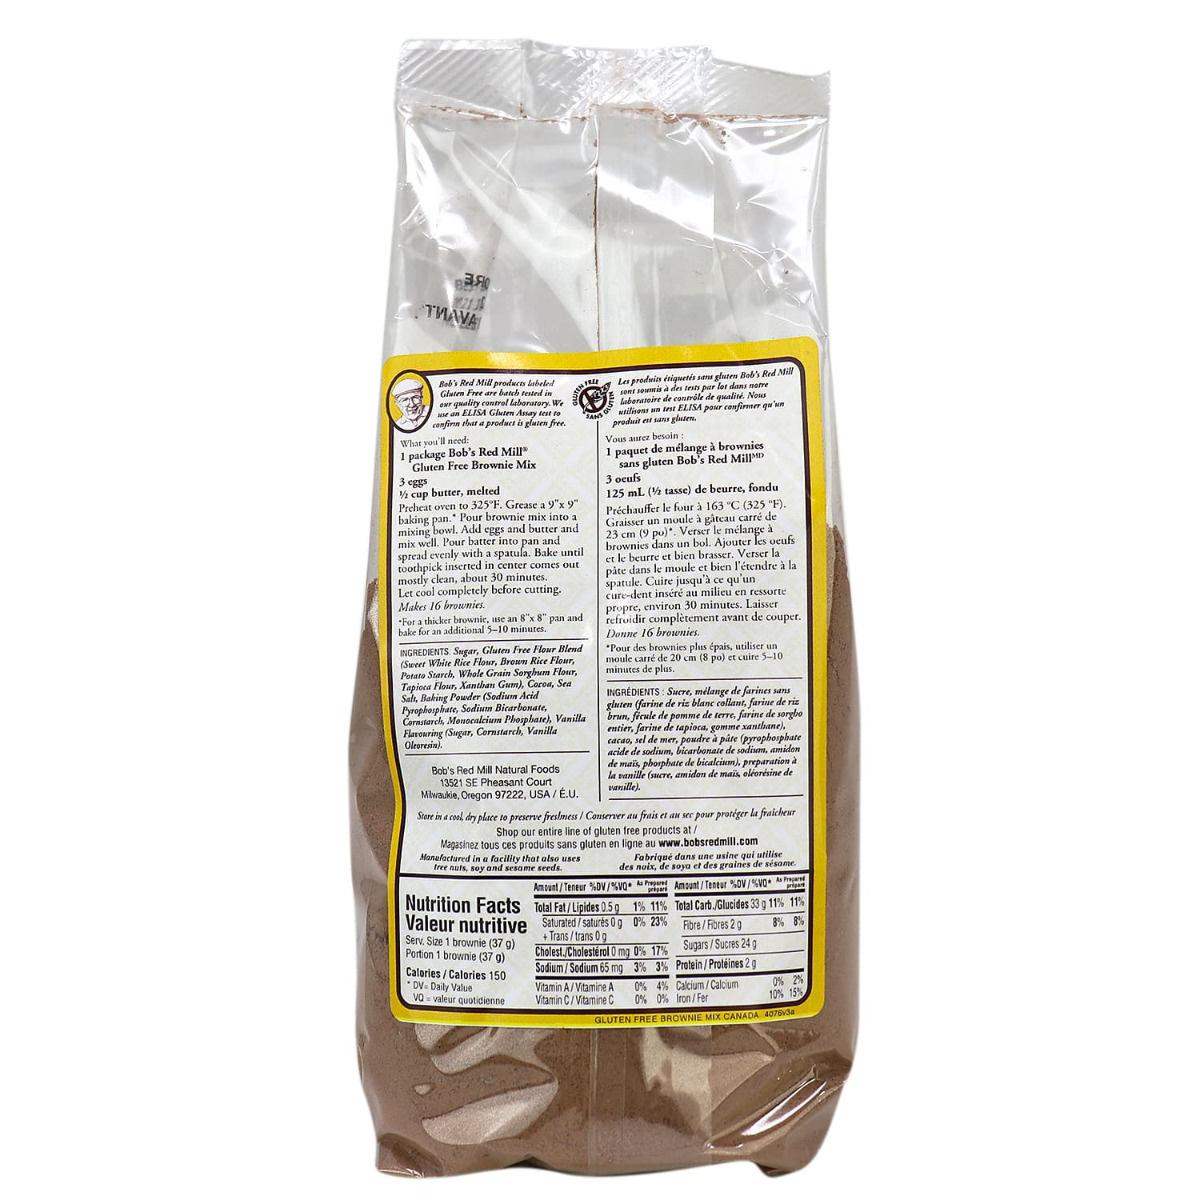 Bob's Red Mill Gluten Free Brownie Mix | NaturaMarket.ca